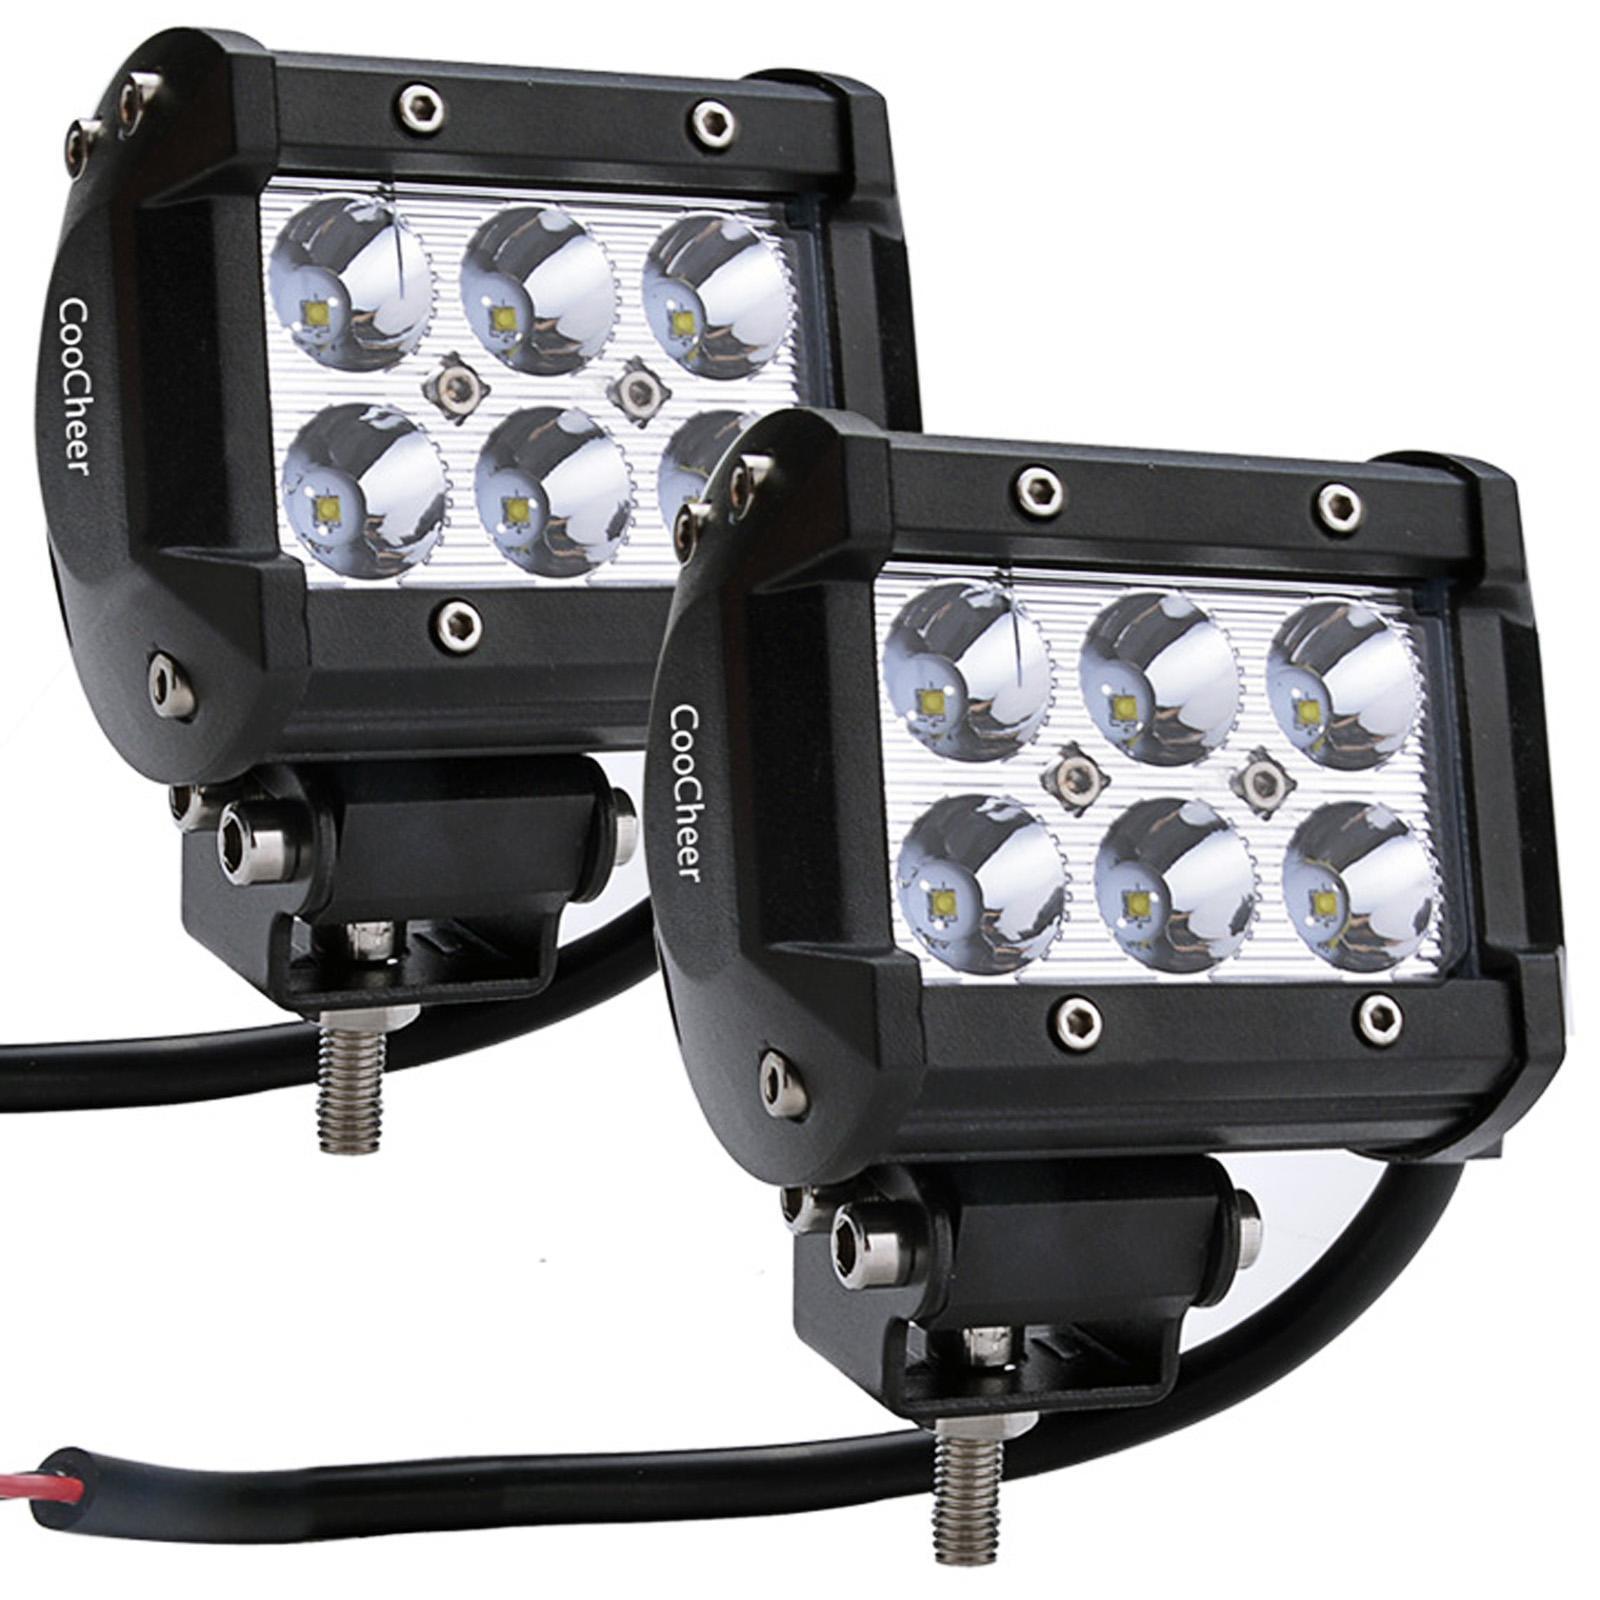 2 Pcs LED Fog Flood Light  Spot Work Bar Light 6500K IP68...